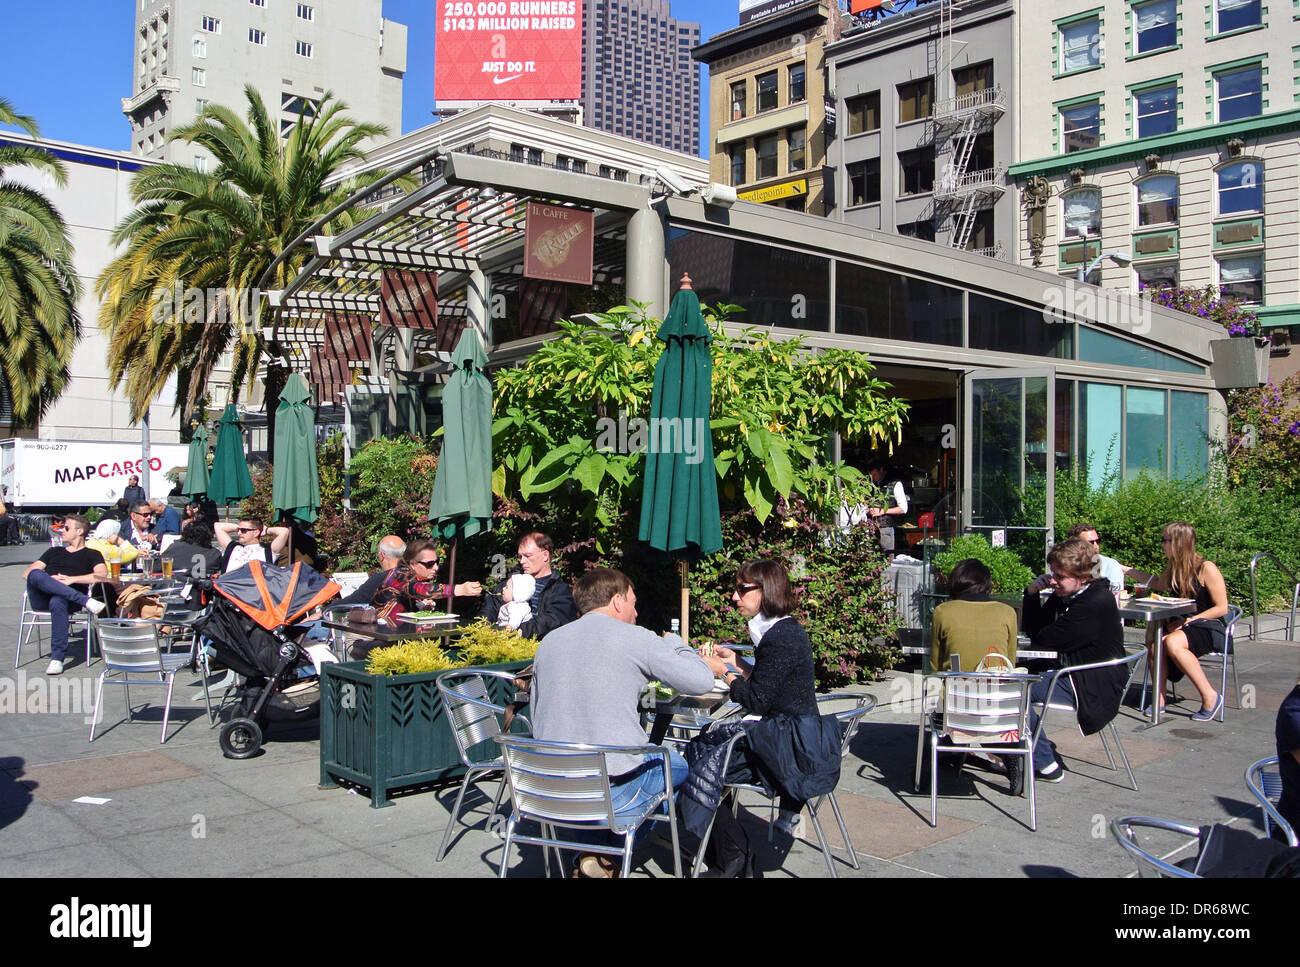 Union Square San Francisco Stock Photos & Union Square San Francisco ...